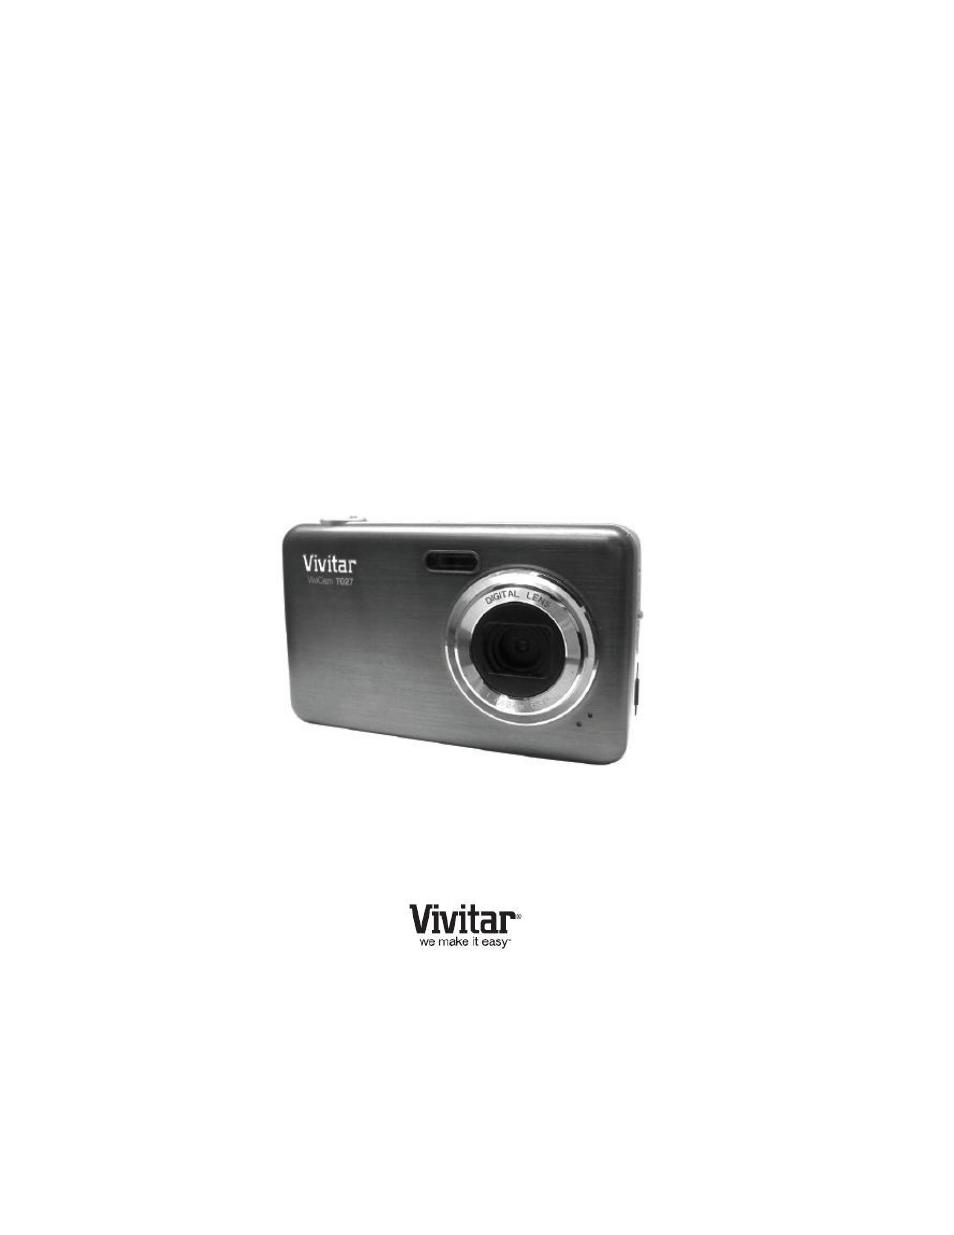 vivitar vivicam t027 user manual 55 pages rh manualsdir com